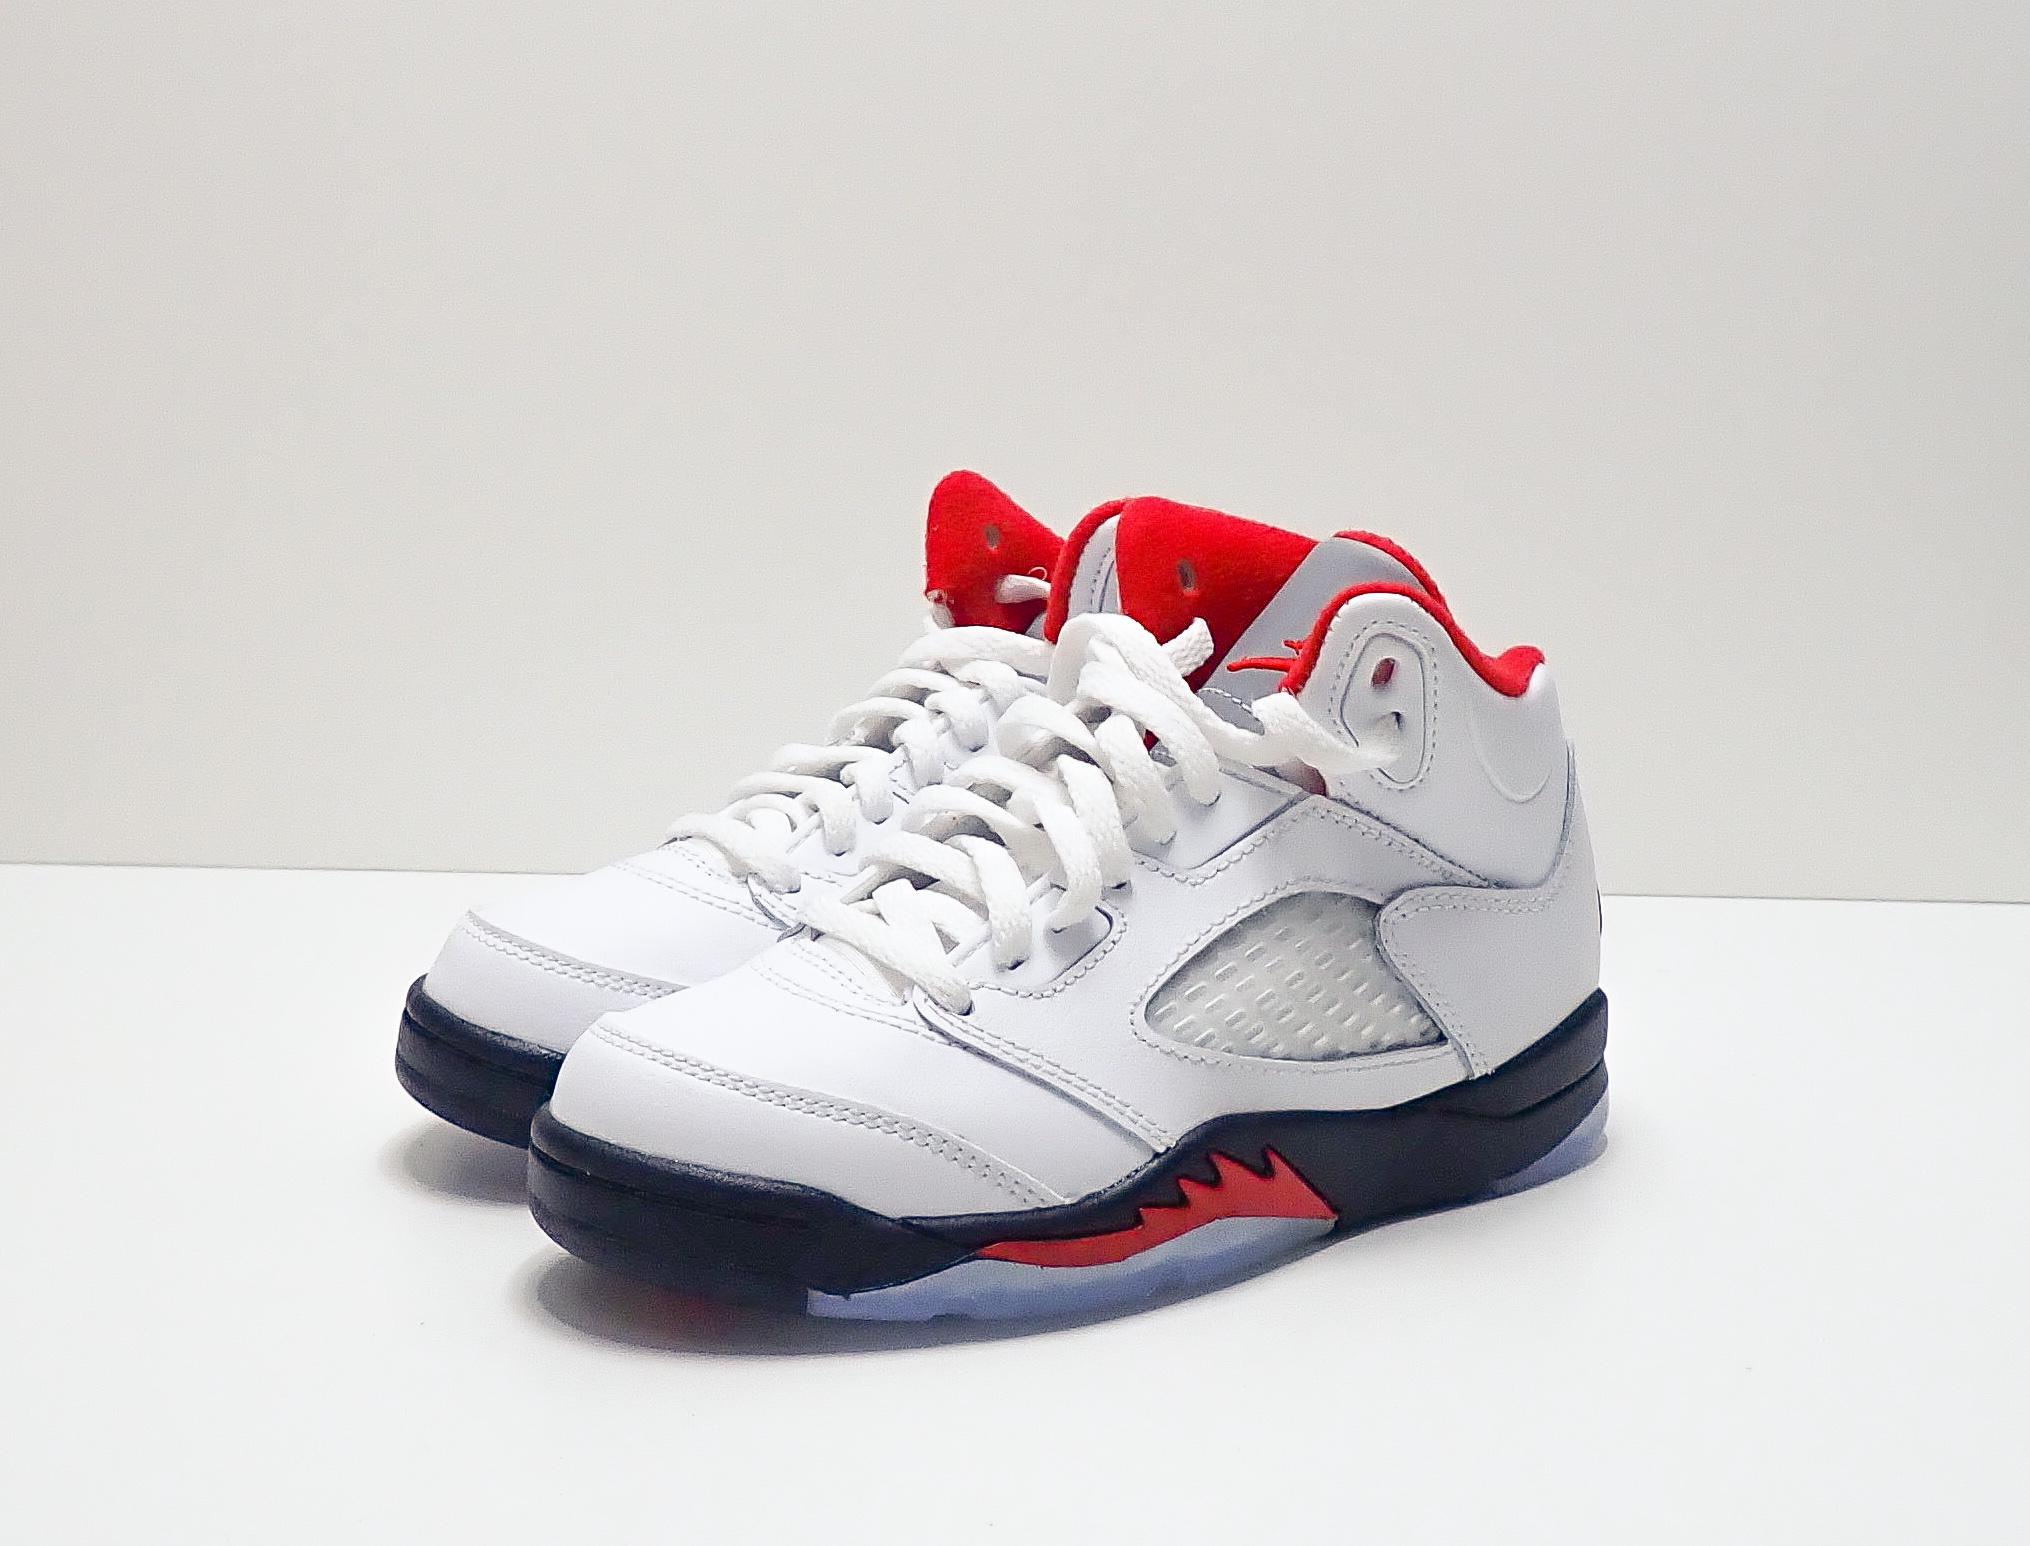 Jordan 5 Retro Fire Red 2020 PS